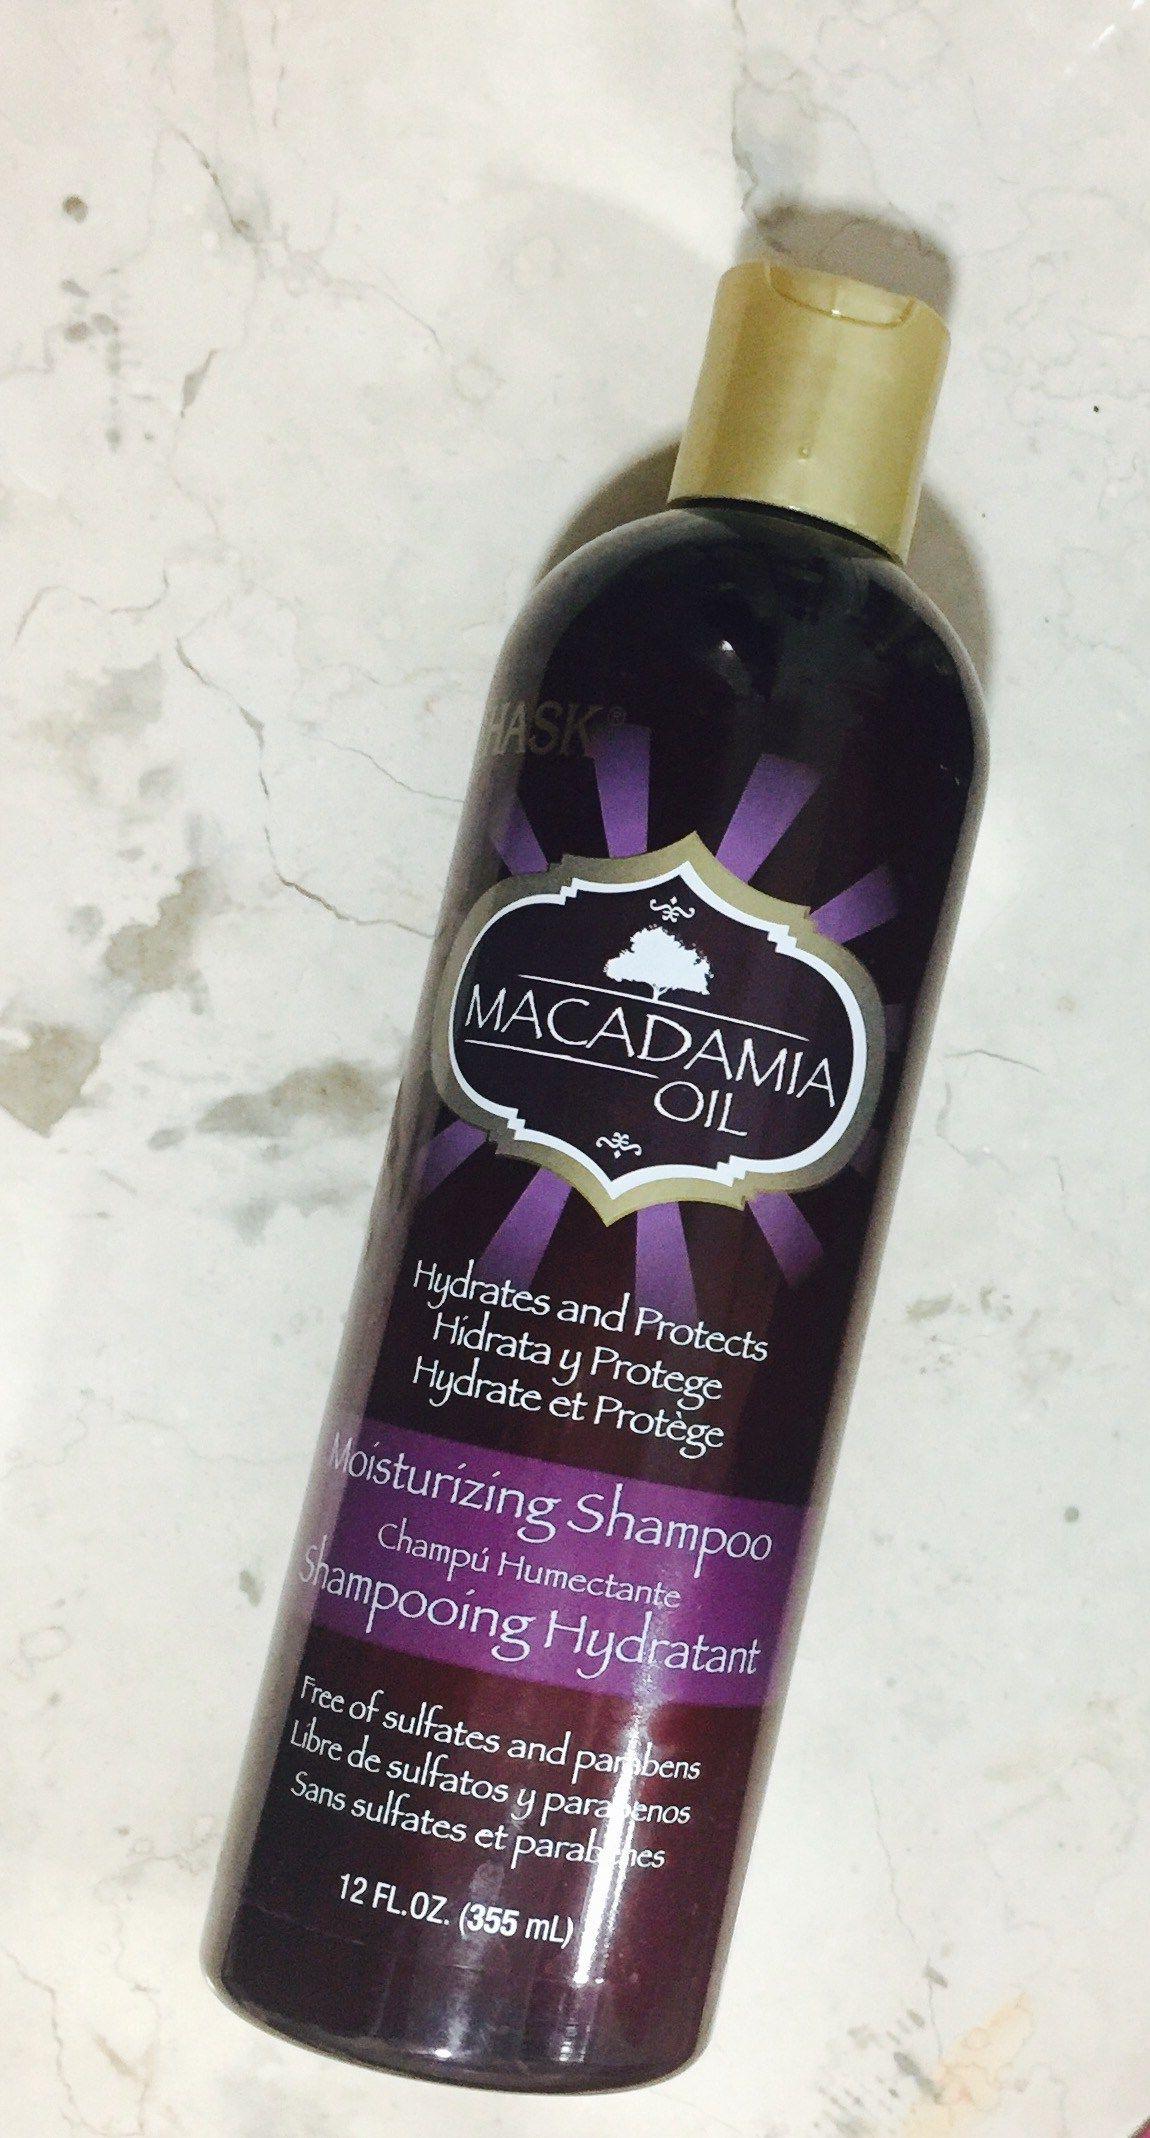 Hask Macadamia Oil Shampoo Hair essentials, Macadamia